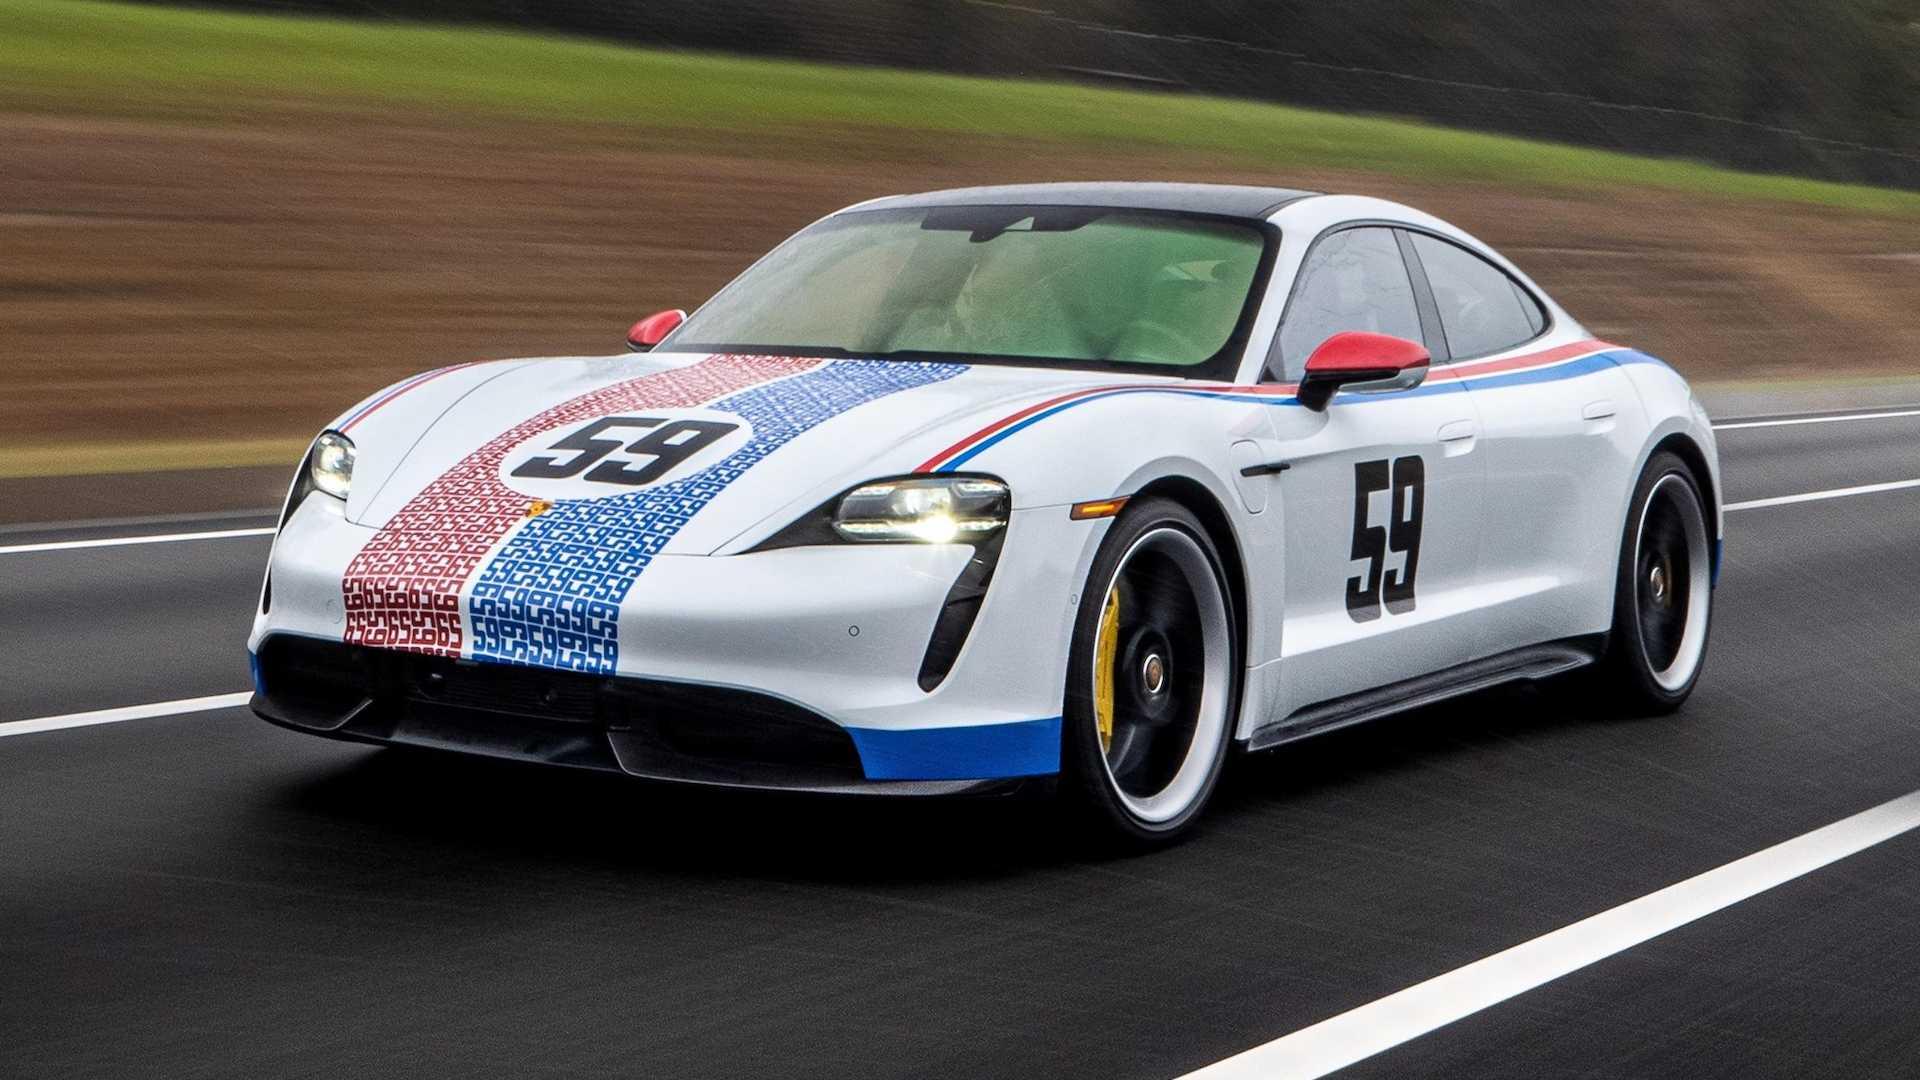 Porsche-Taycan-In-Racing-Liveries-3